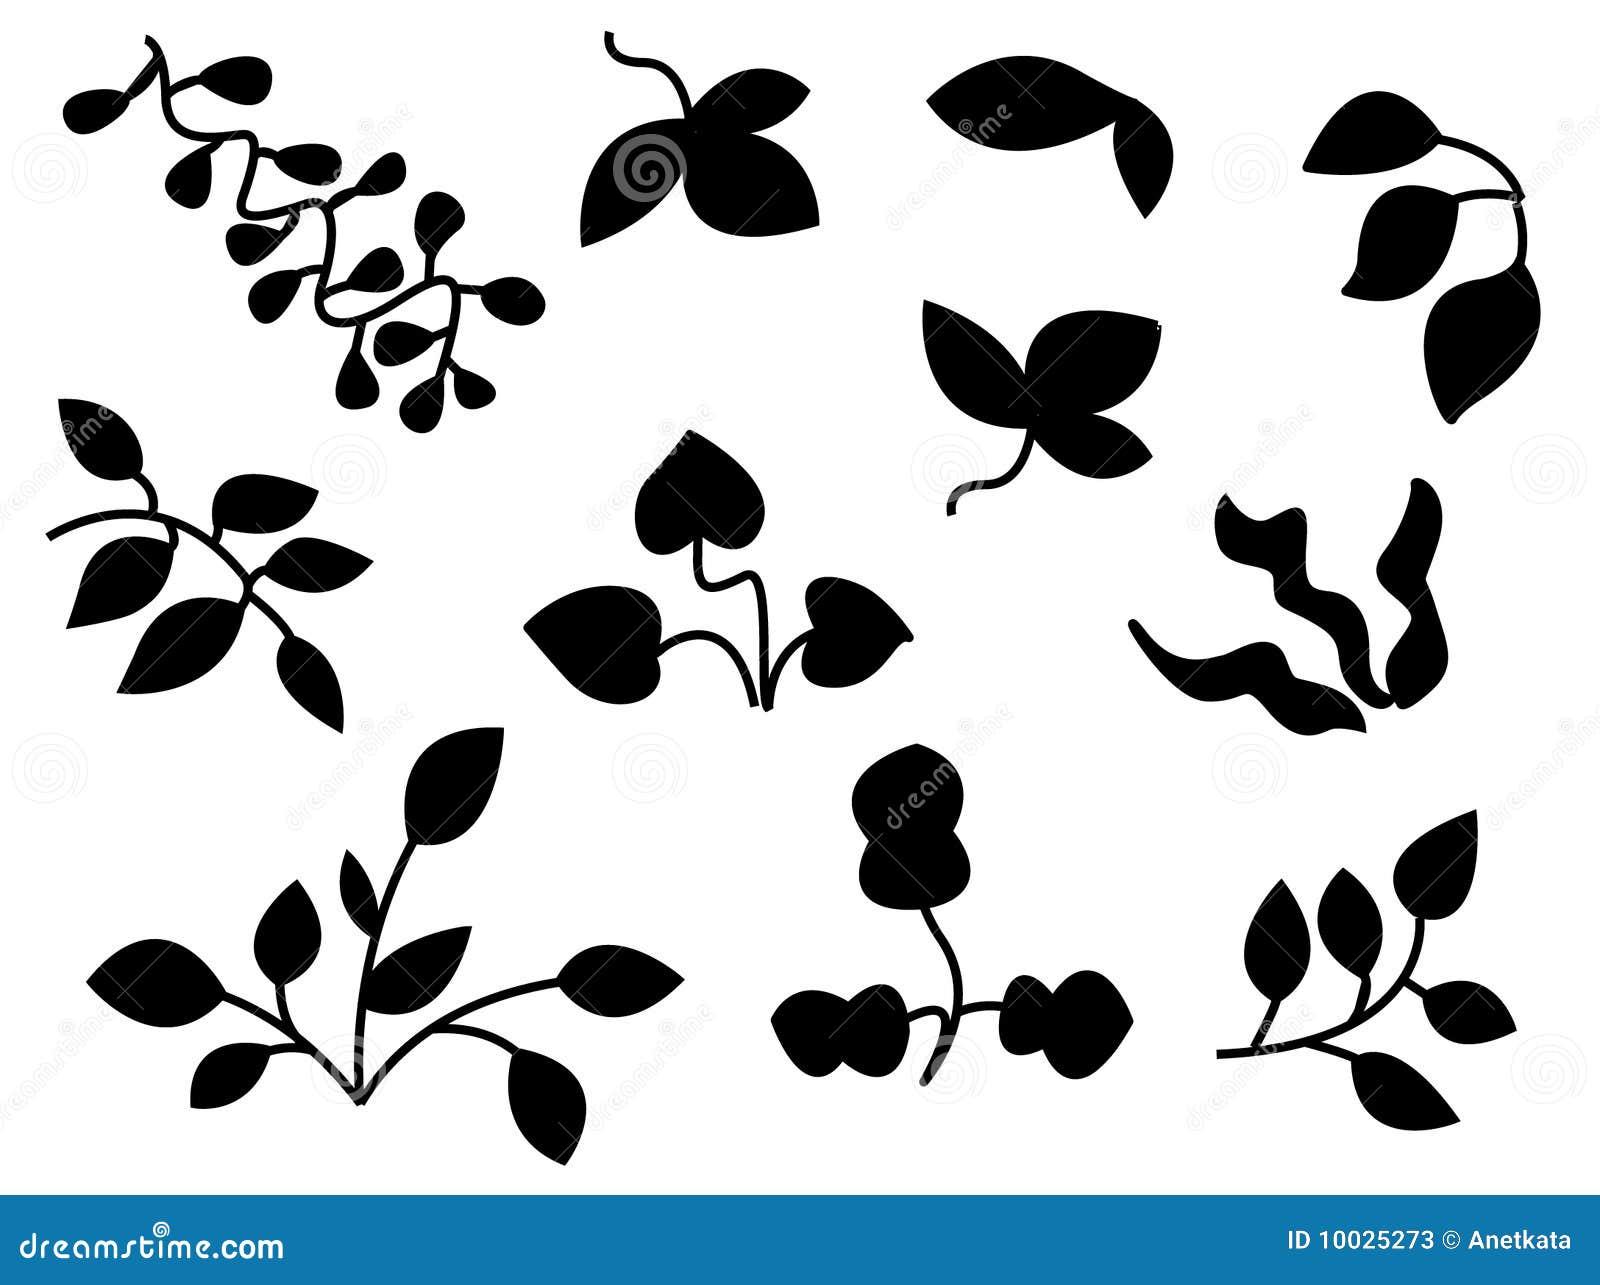 vector clip art nature - photo #30